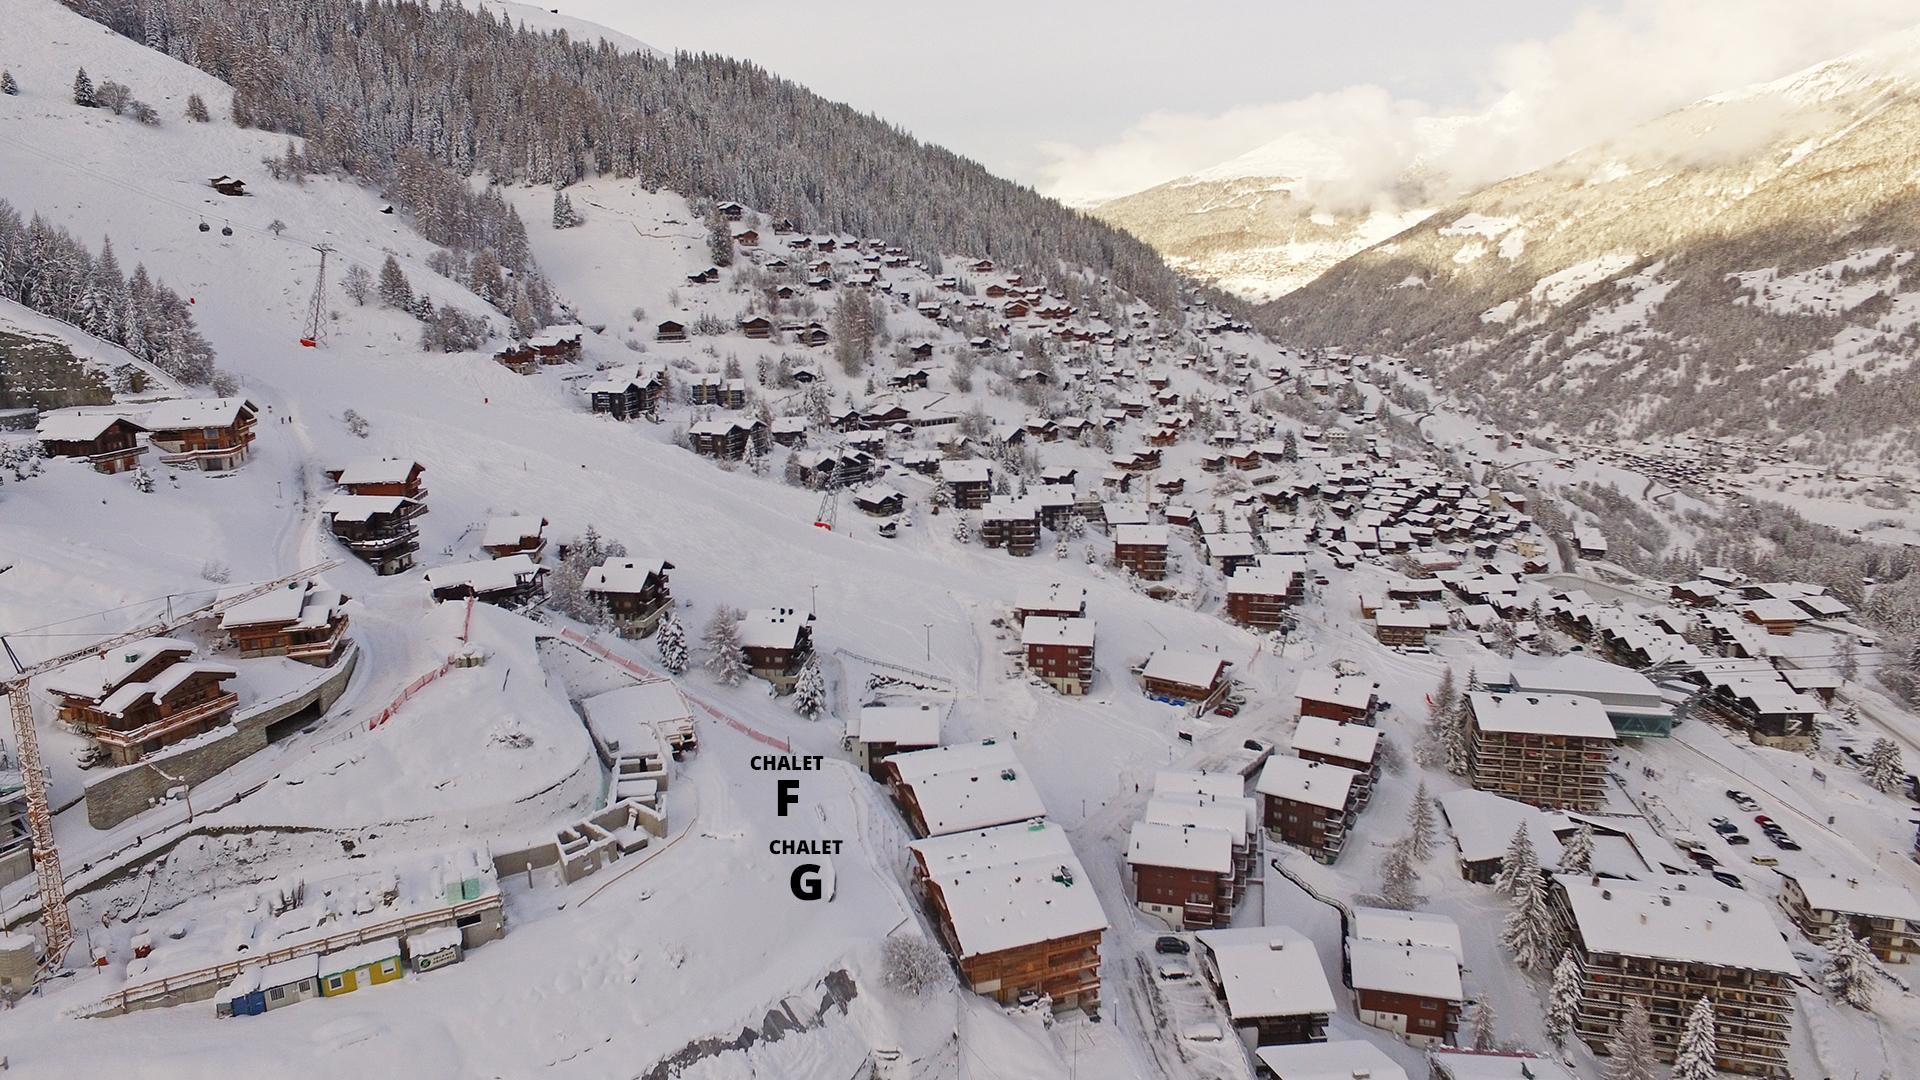 Chalets Adelaide I Chalet, Switzerland